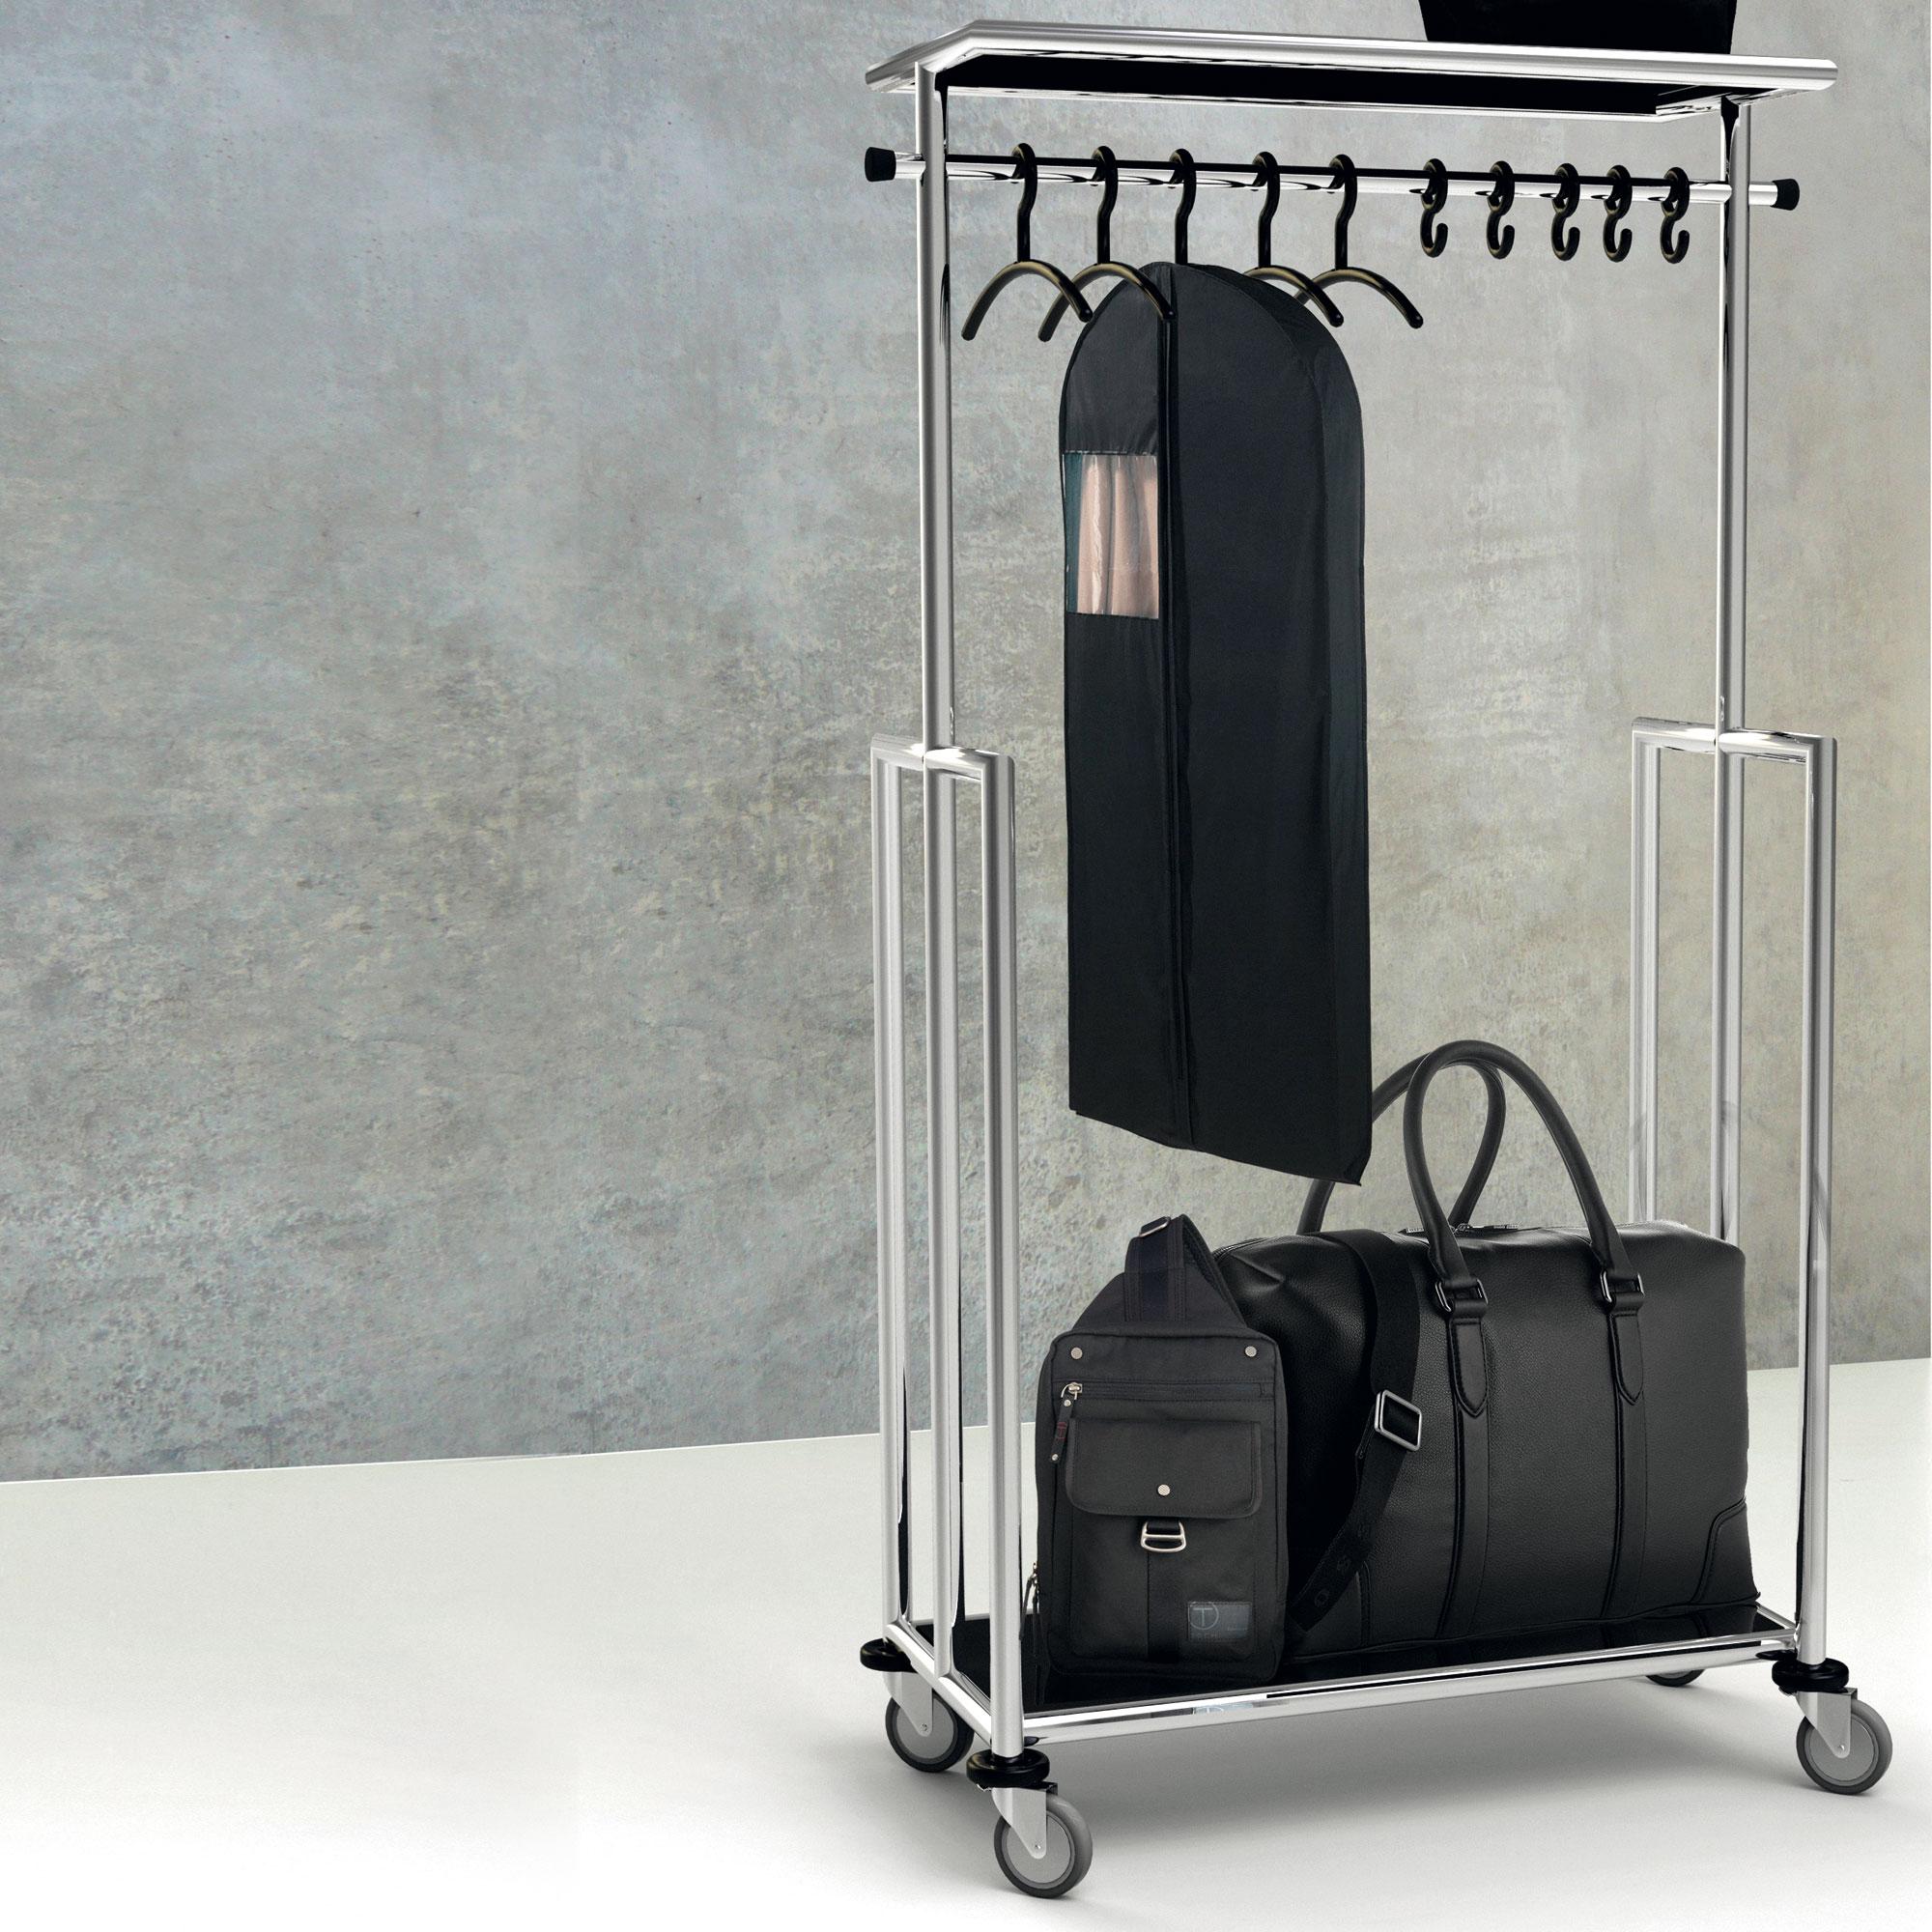 Garderobenwagen